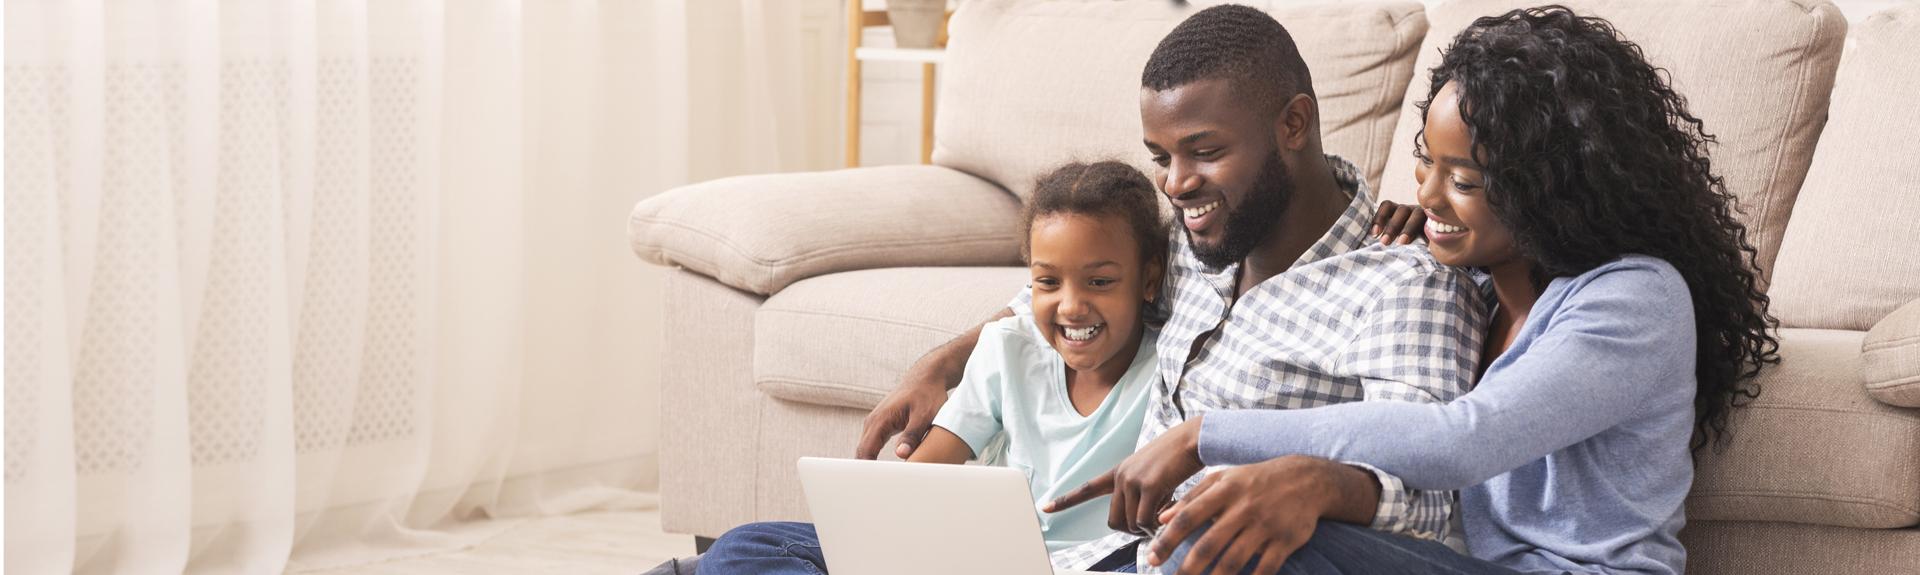 Family looking at computer.